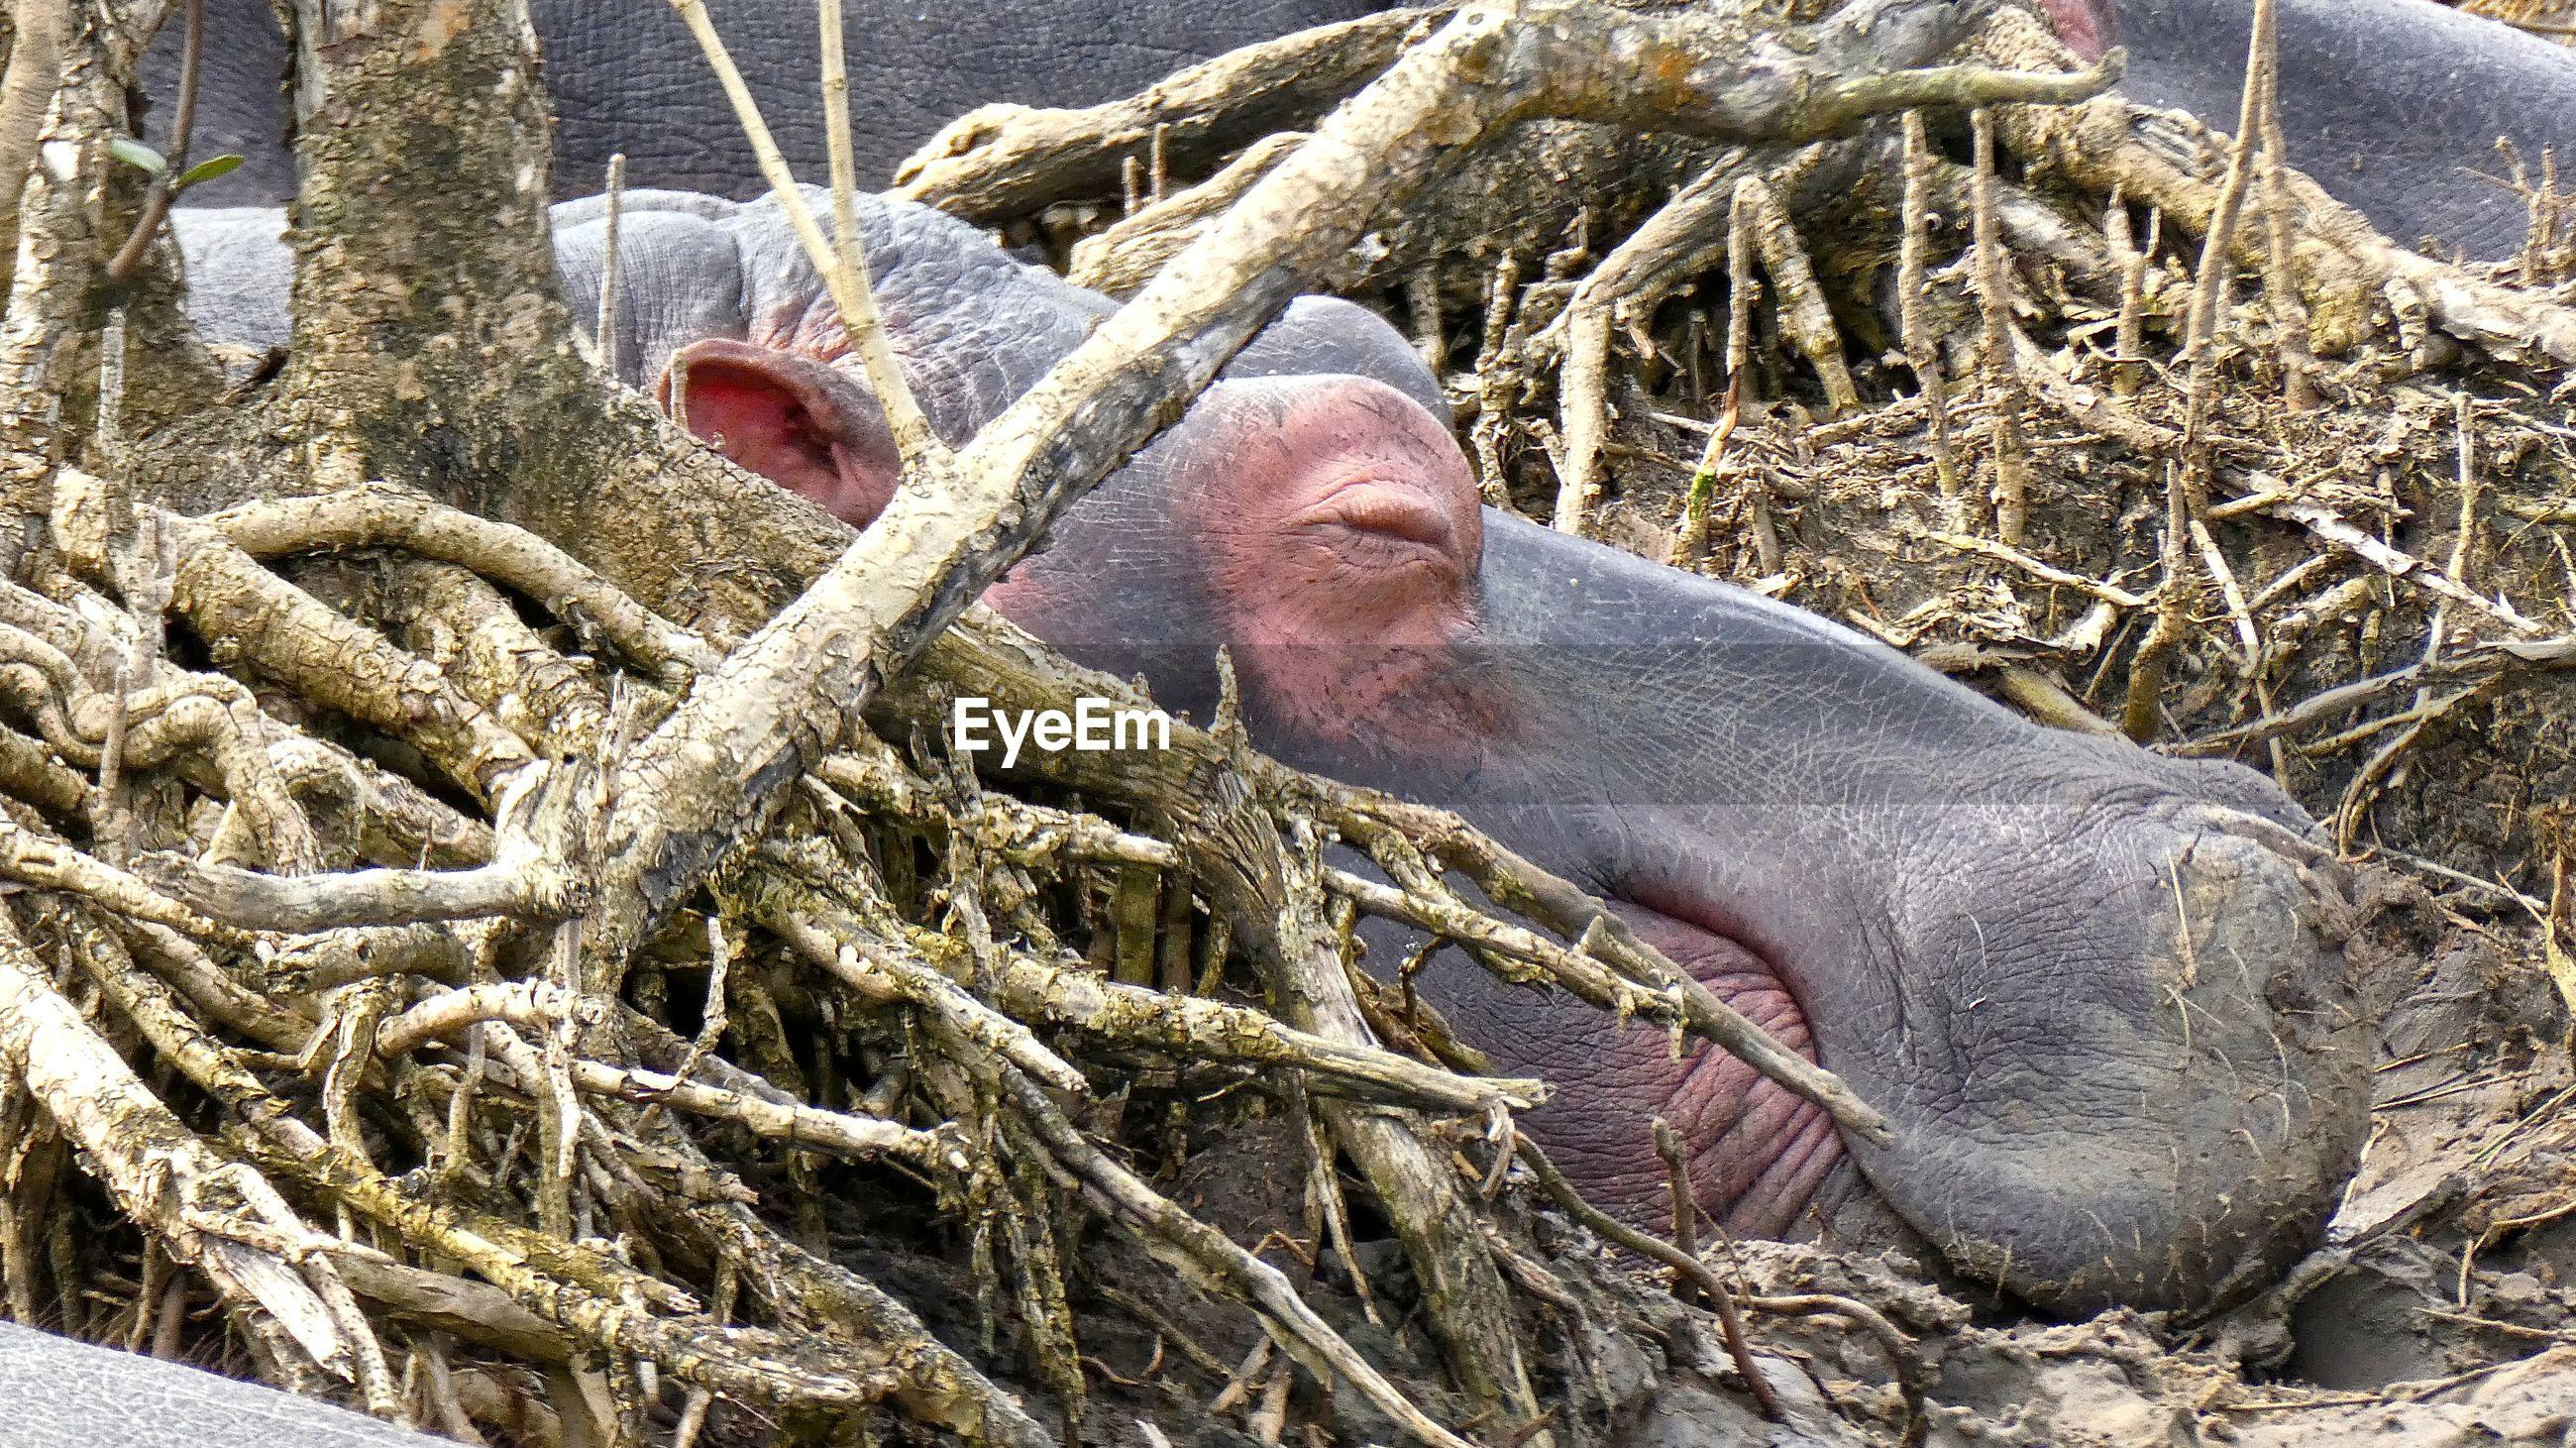 Close-up of rhino